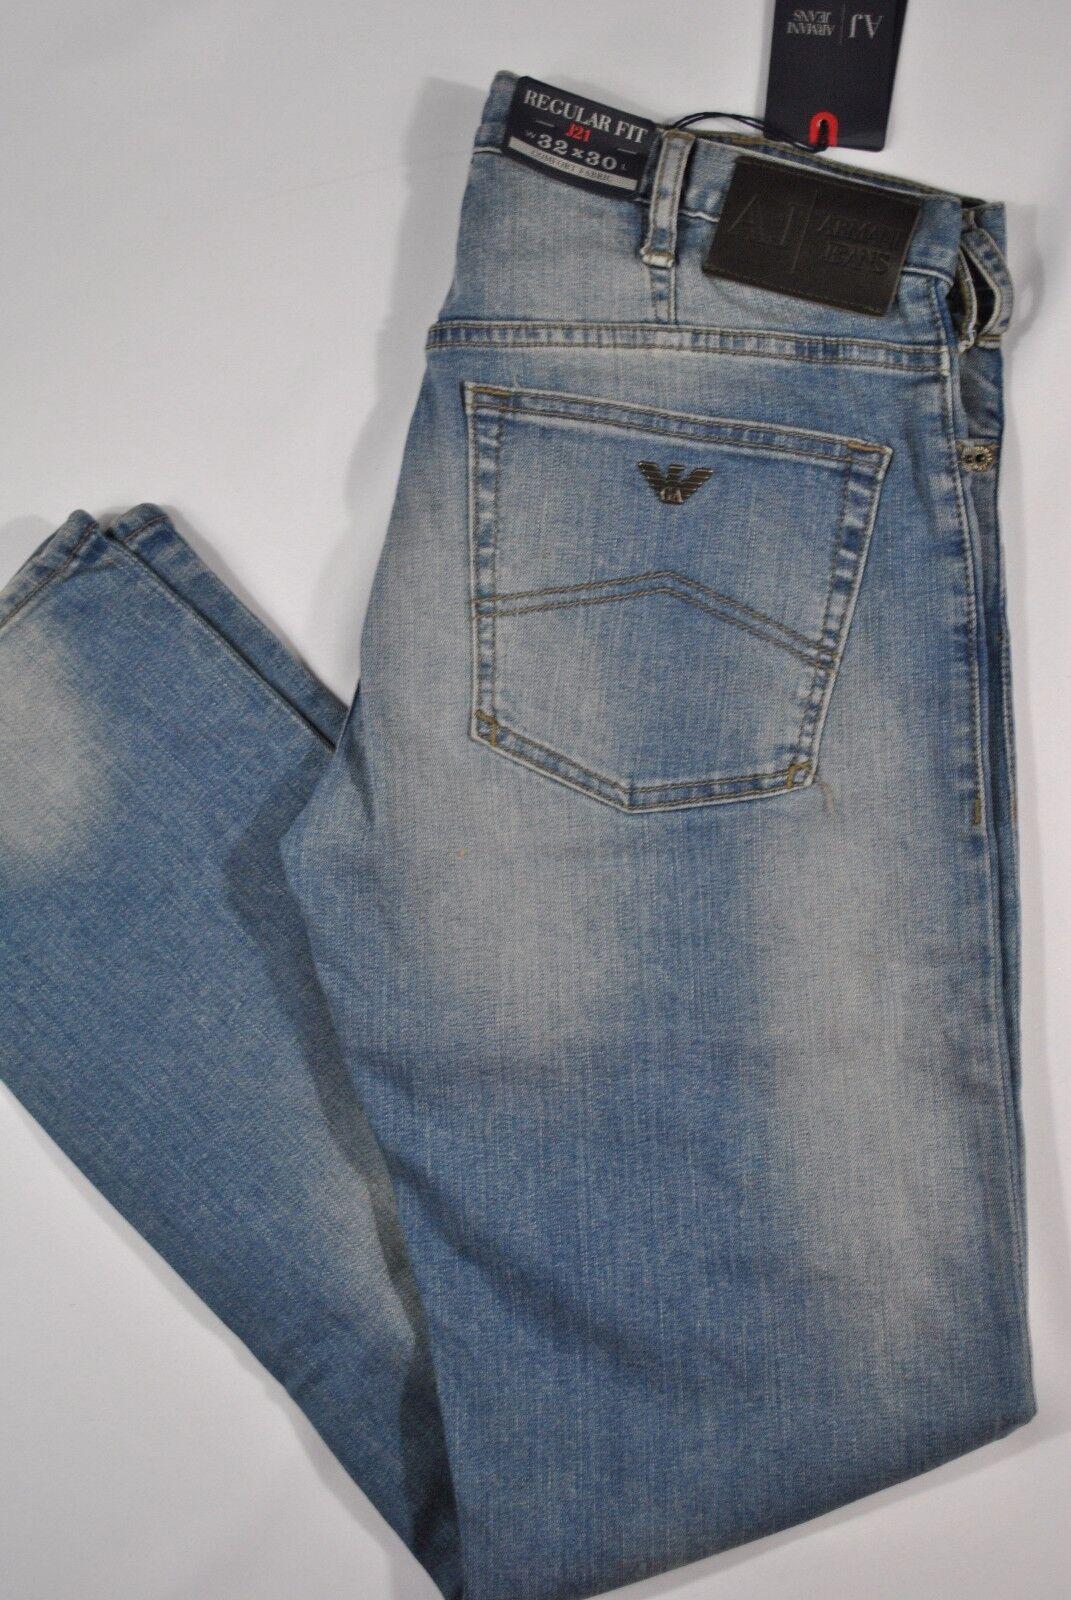 5d500e64 NEW MENS Armani J21 3T Light Wash Straight-Leg jean SIZES Regular-Fit Jeans  nfhxiy9460-Jeans